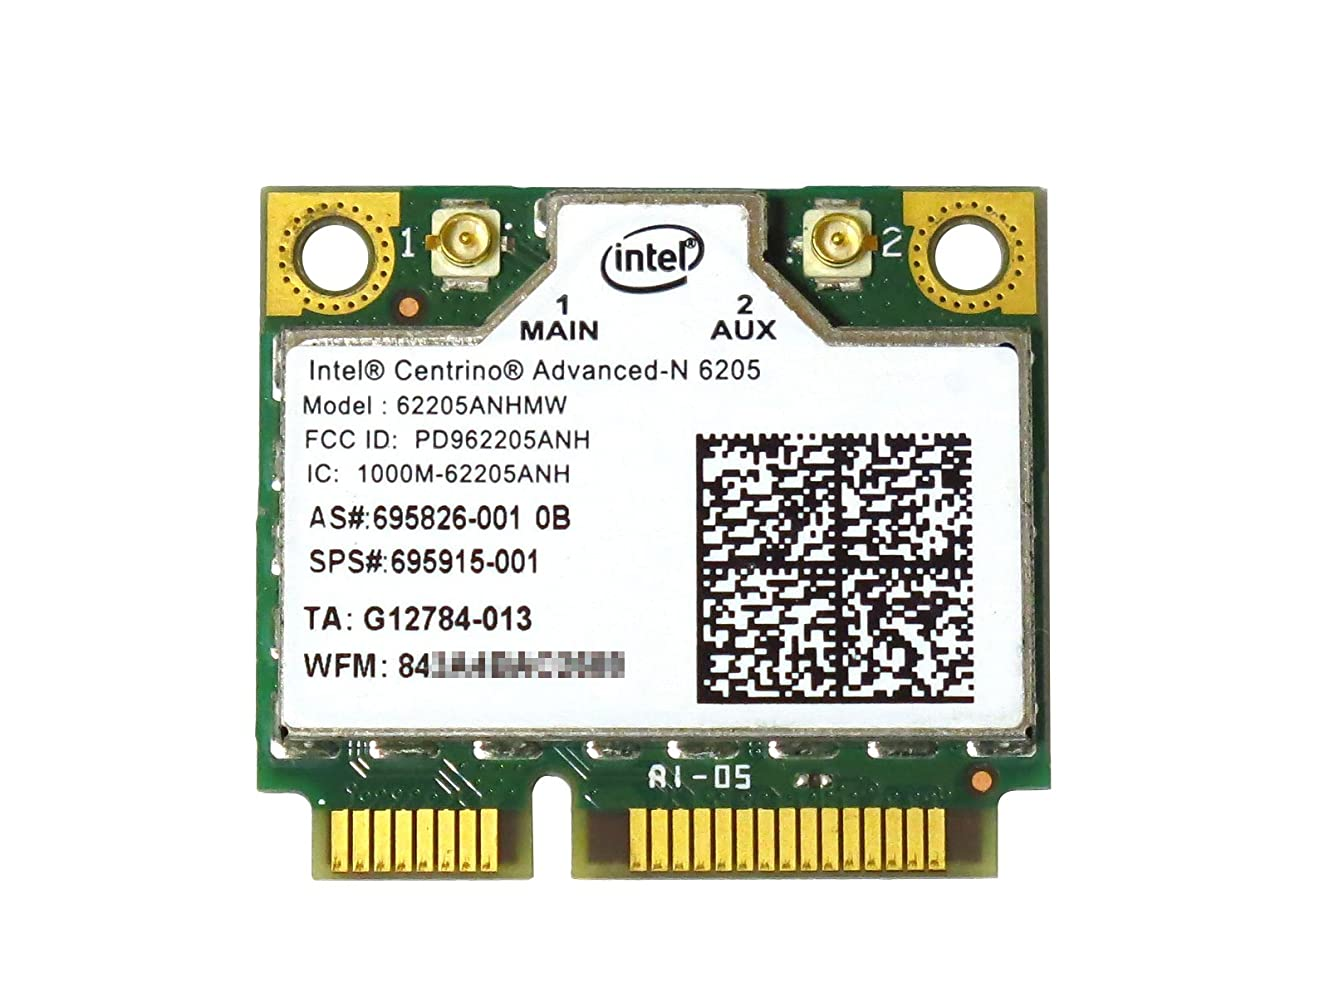 HP 695915-001 Intel Centrino Advanced-N 6205 62205ANHMW 802.11a/b/g/n 300Mbps 2X2 HMC 無線LANカード